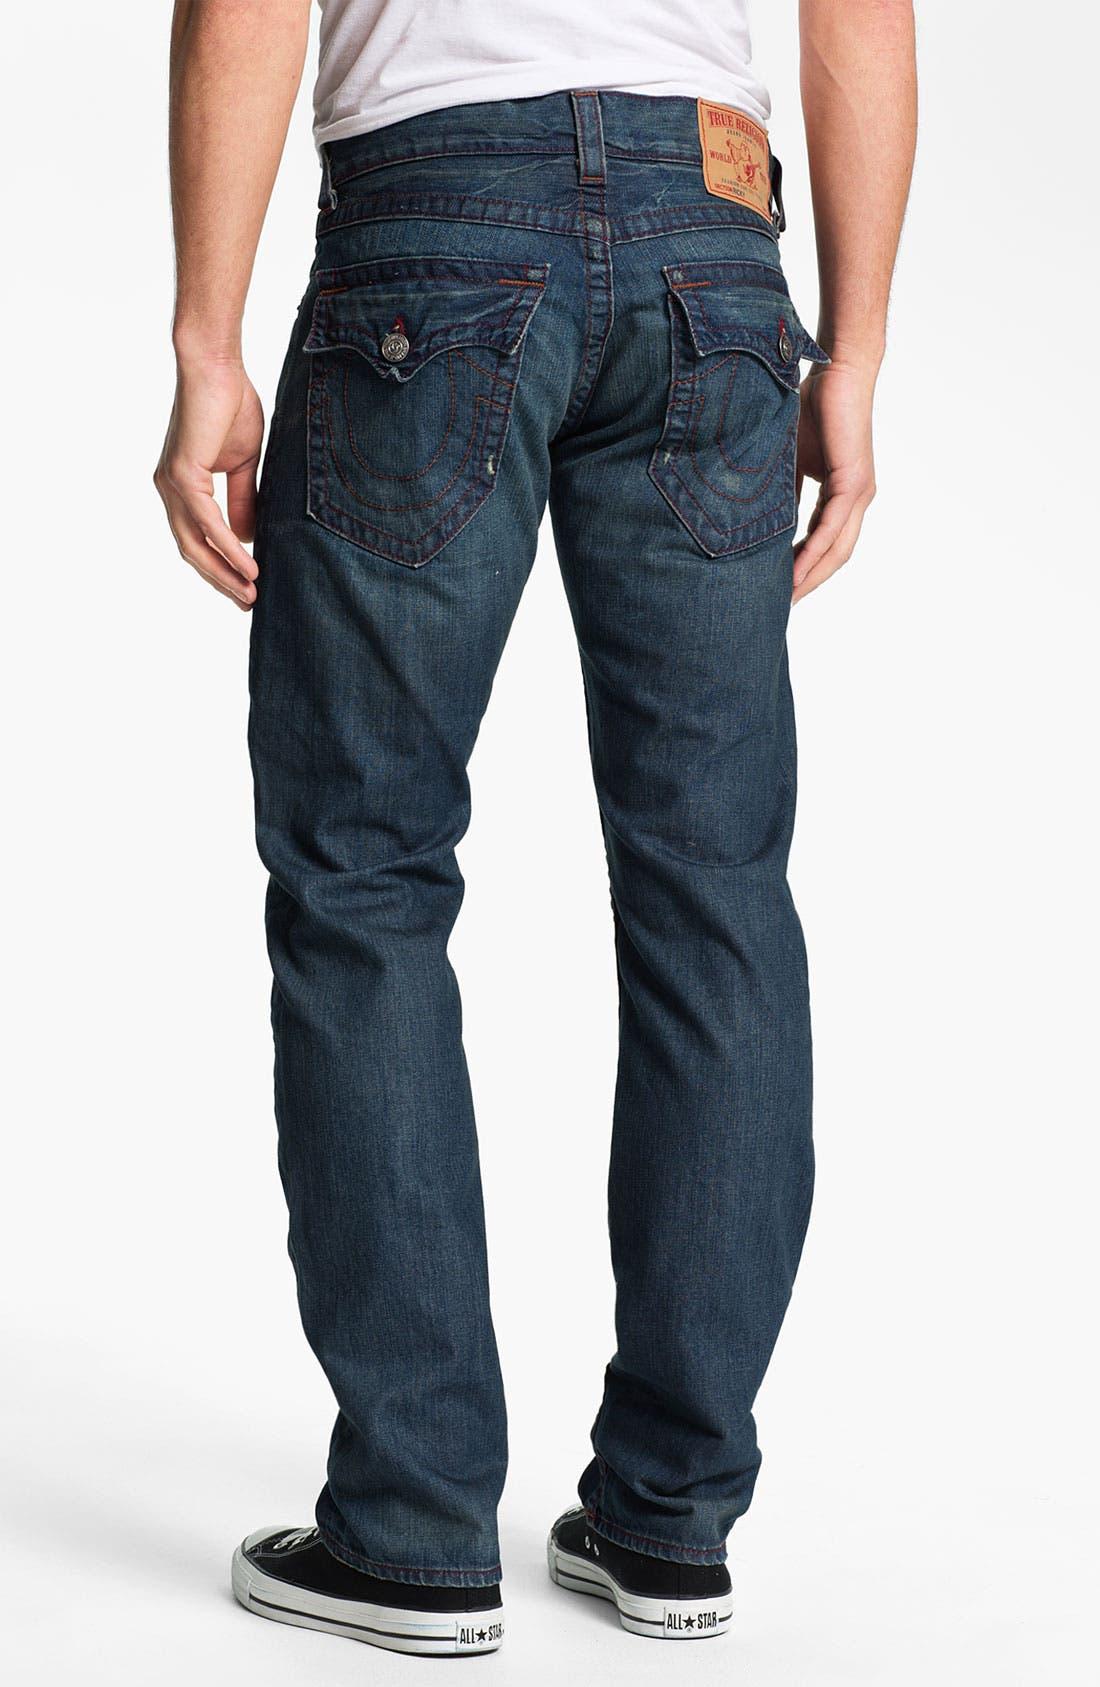 Main Image - True Religion Brand Jeans 'Ricky' Straight Leg Jeans (Dark Drifter)